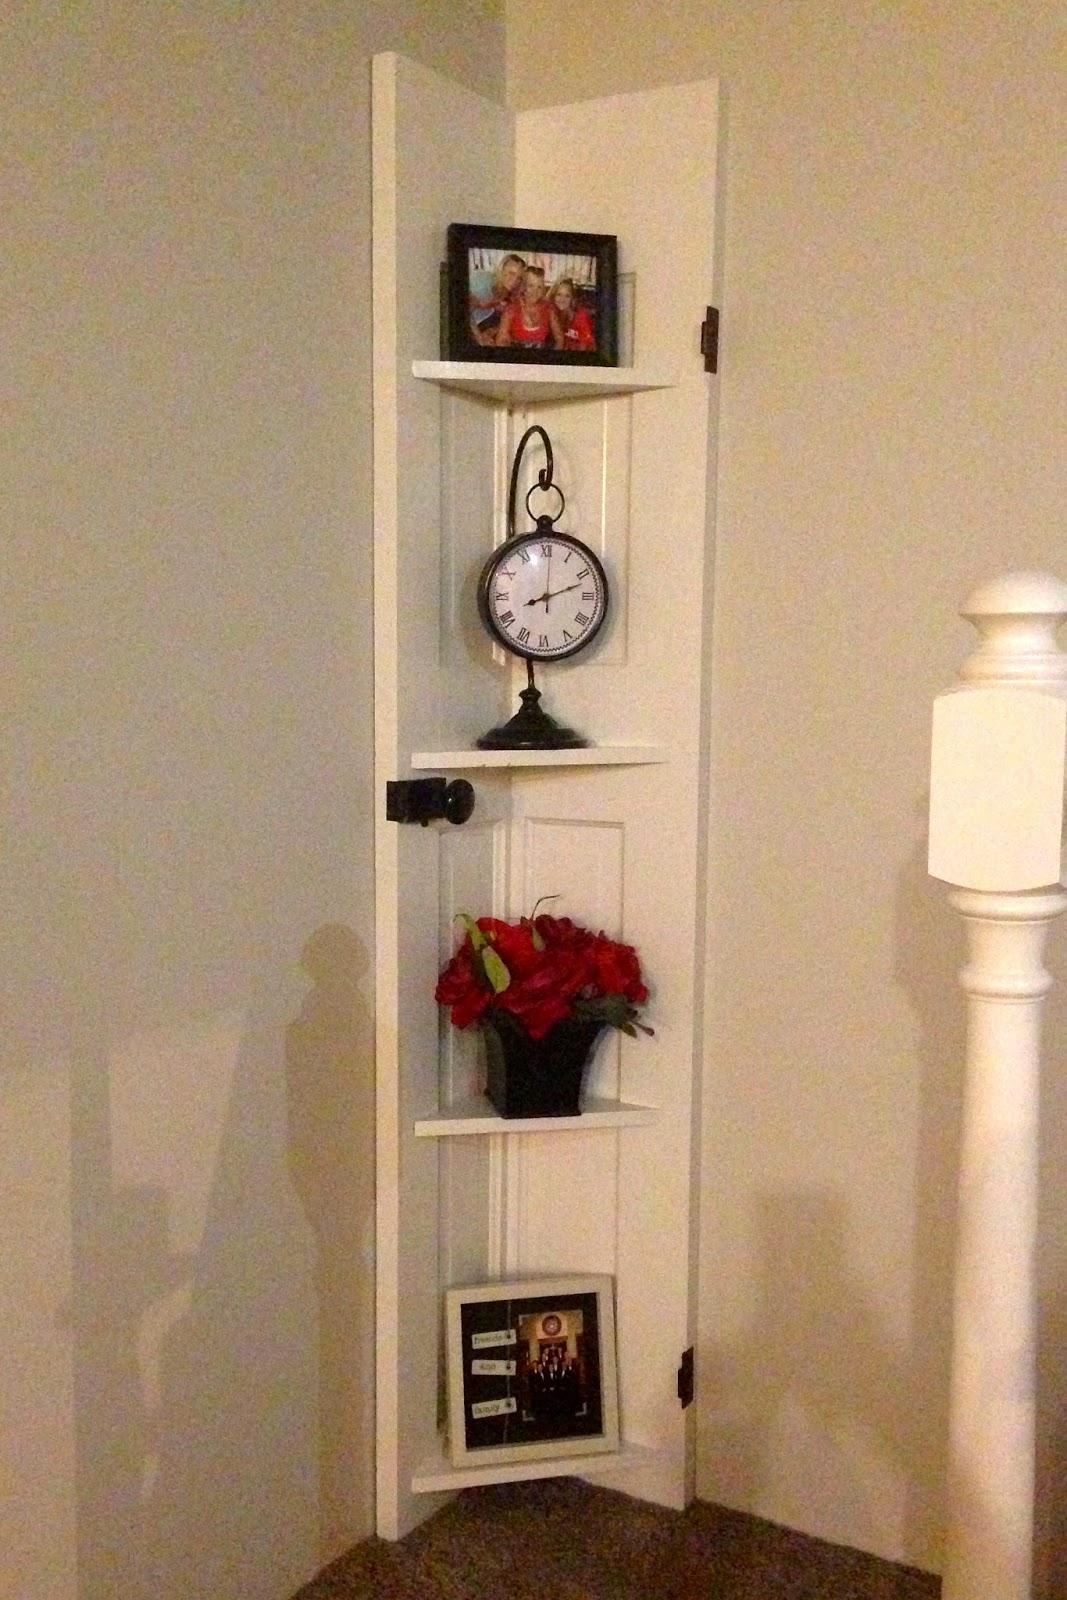 Lighting Basement Washroom Stairs: DIY Why Spend More: Old Door Turned Into Corner Shelf